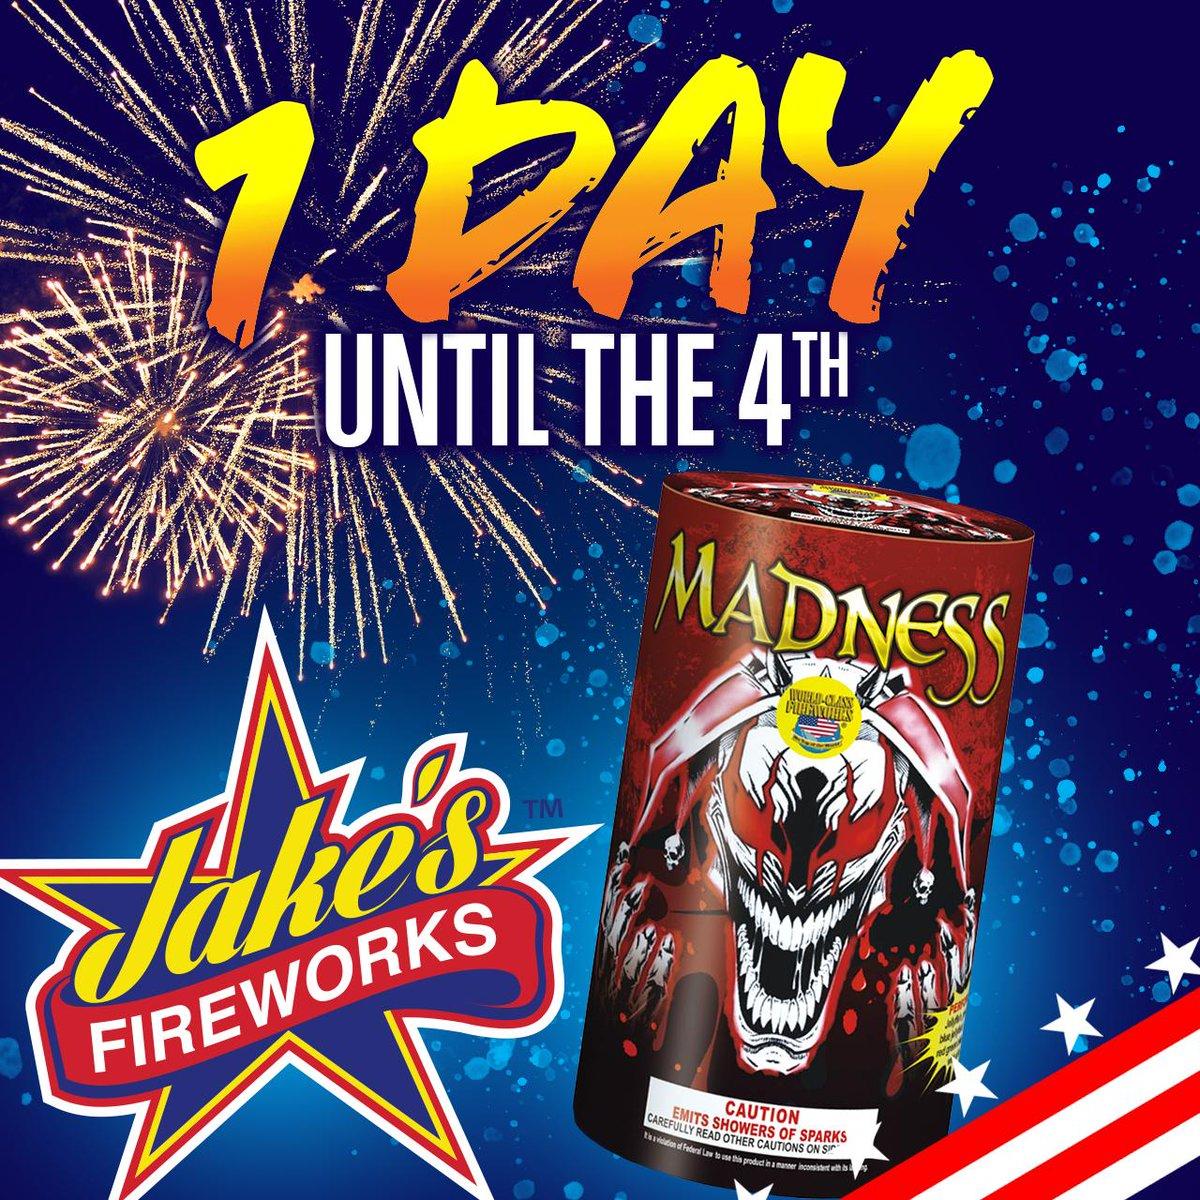 Jake's Fireworks (@jakesfireworks) | Twitter